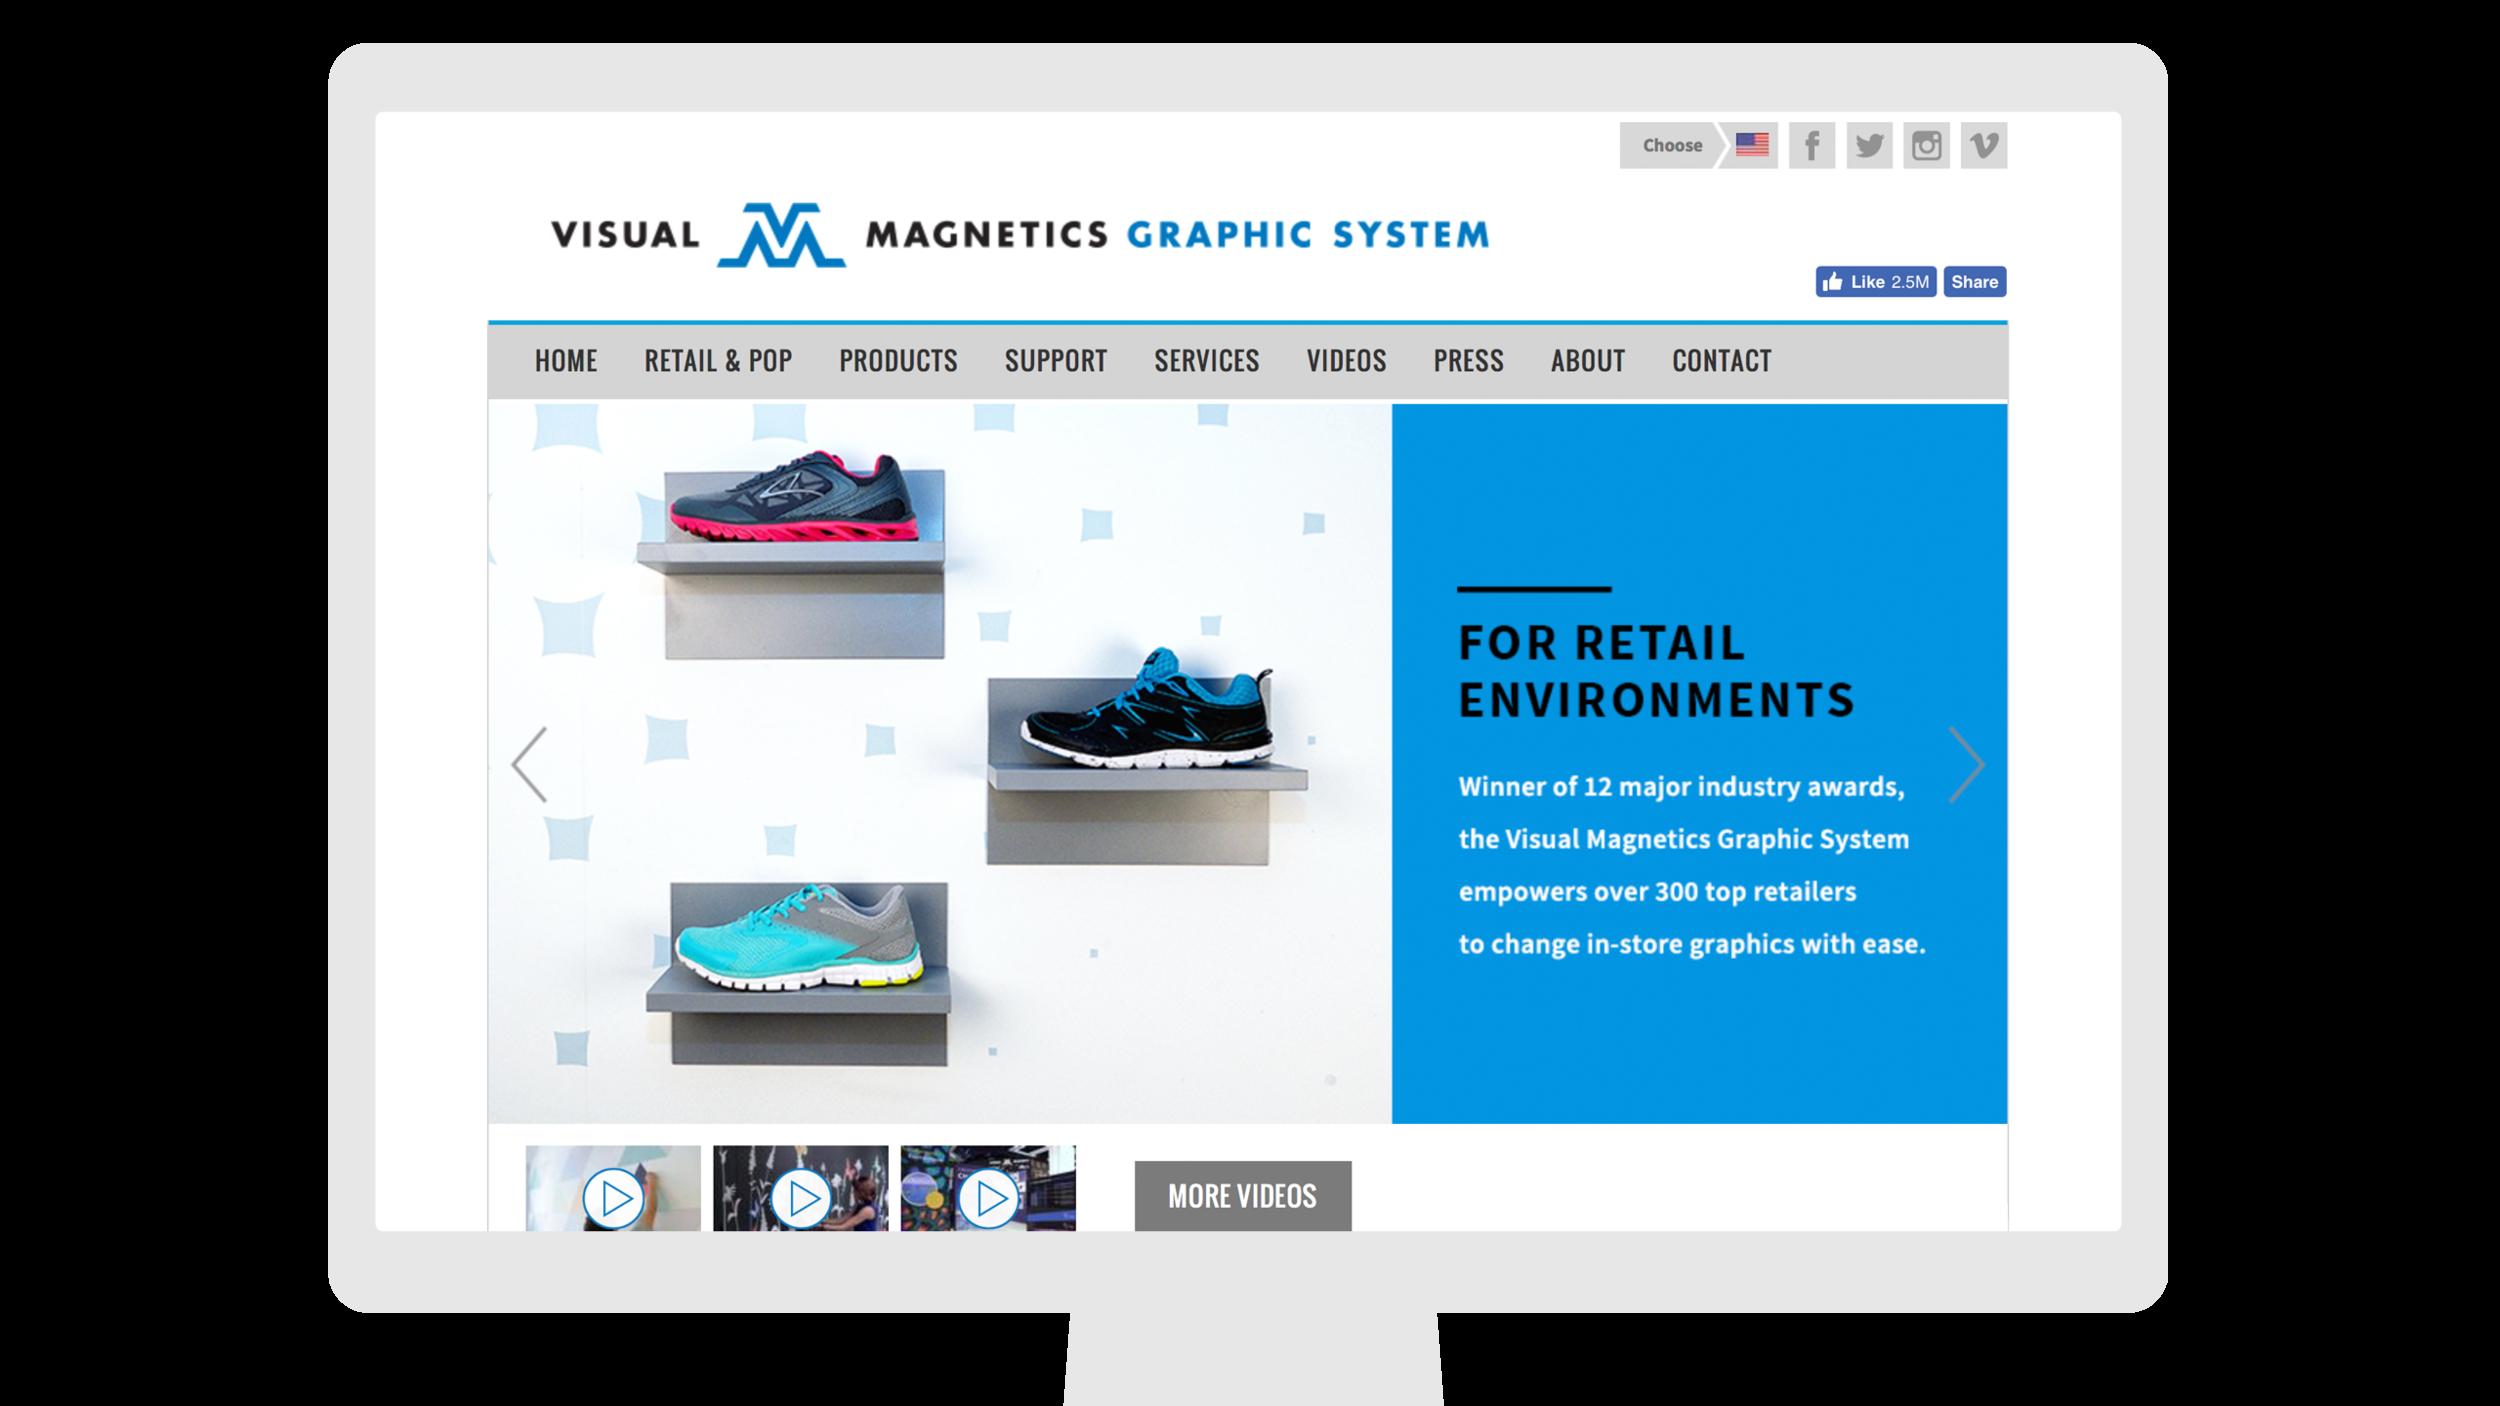 Visual Magnetics Graphic System